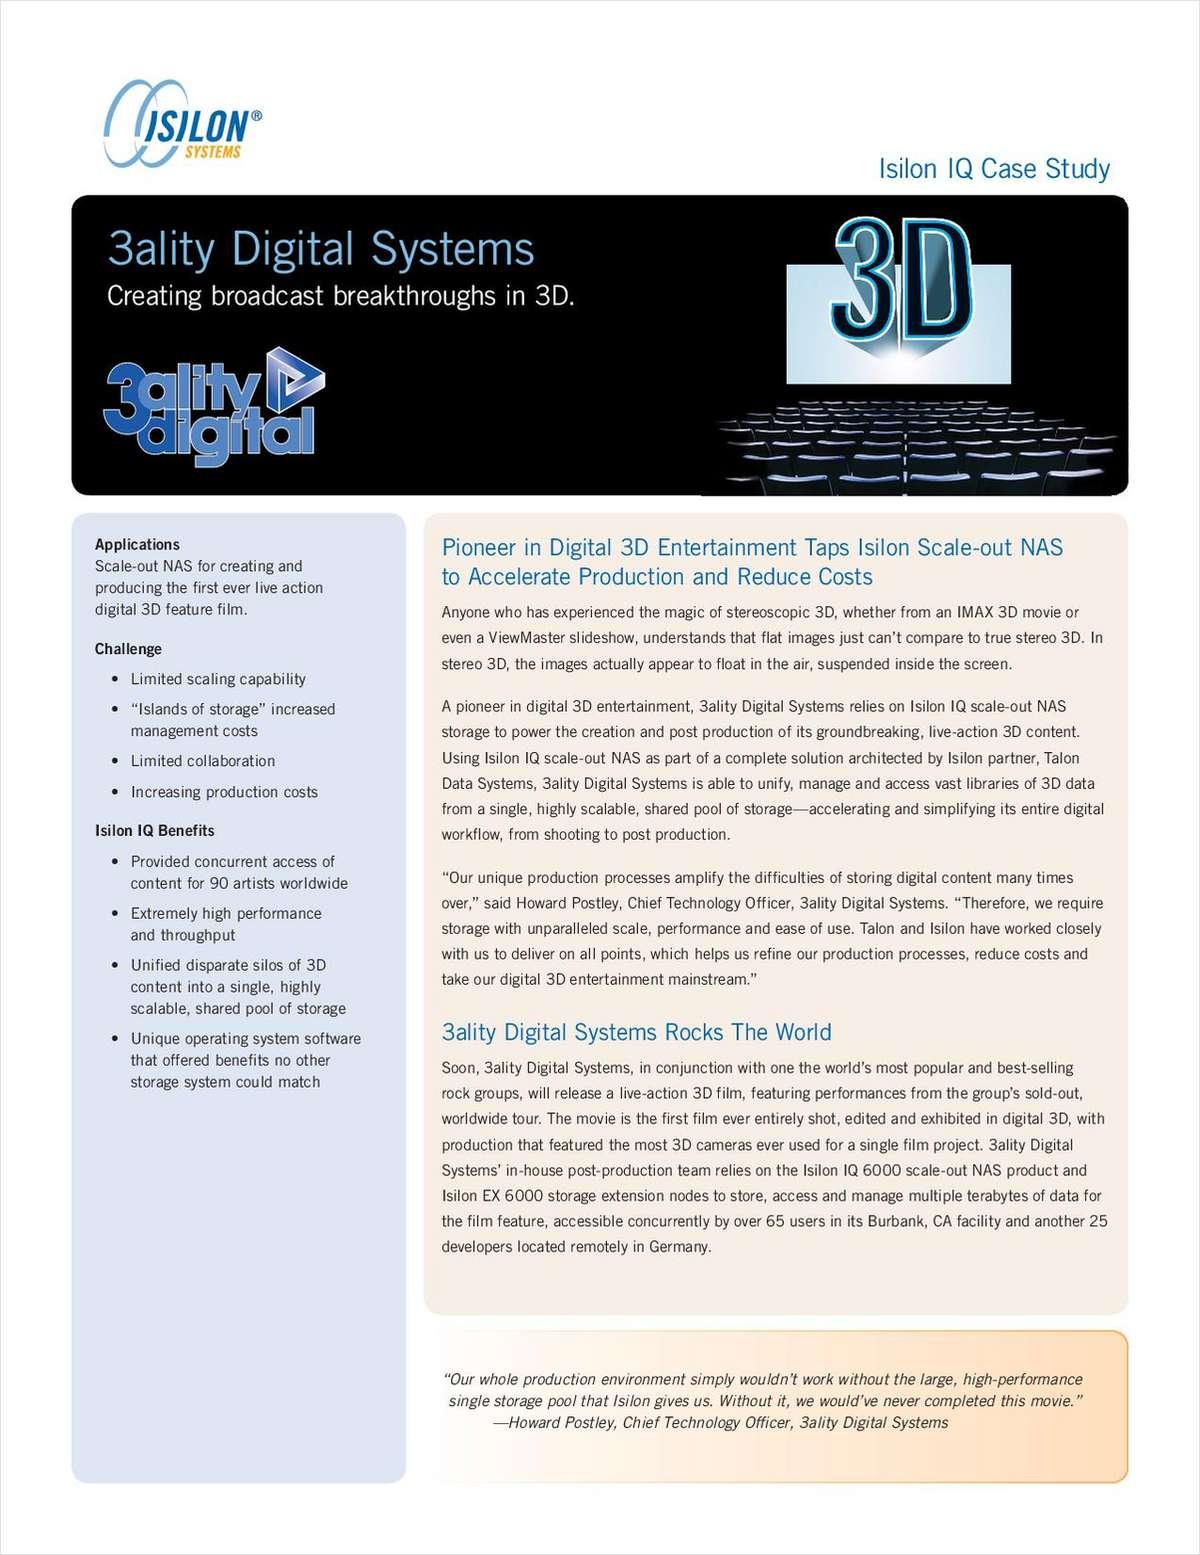 Isilon IQ Case Study: 3ality Digital Systems